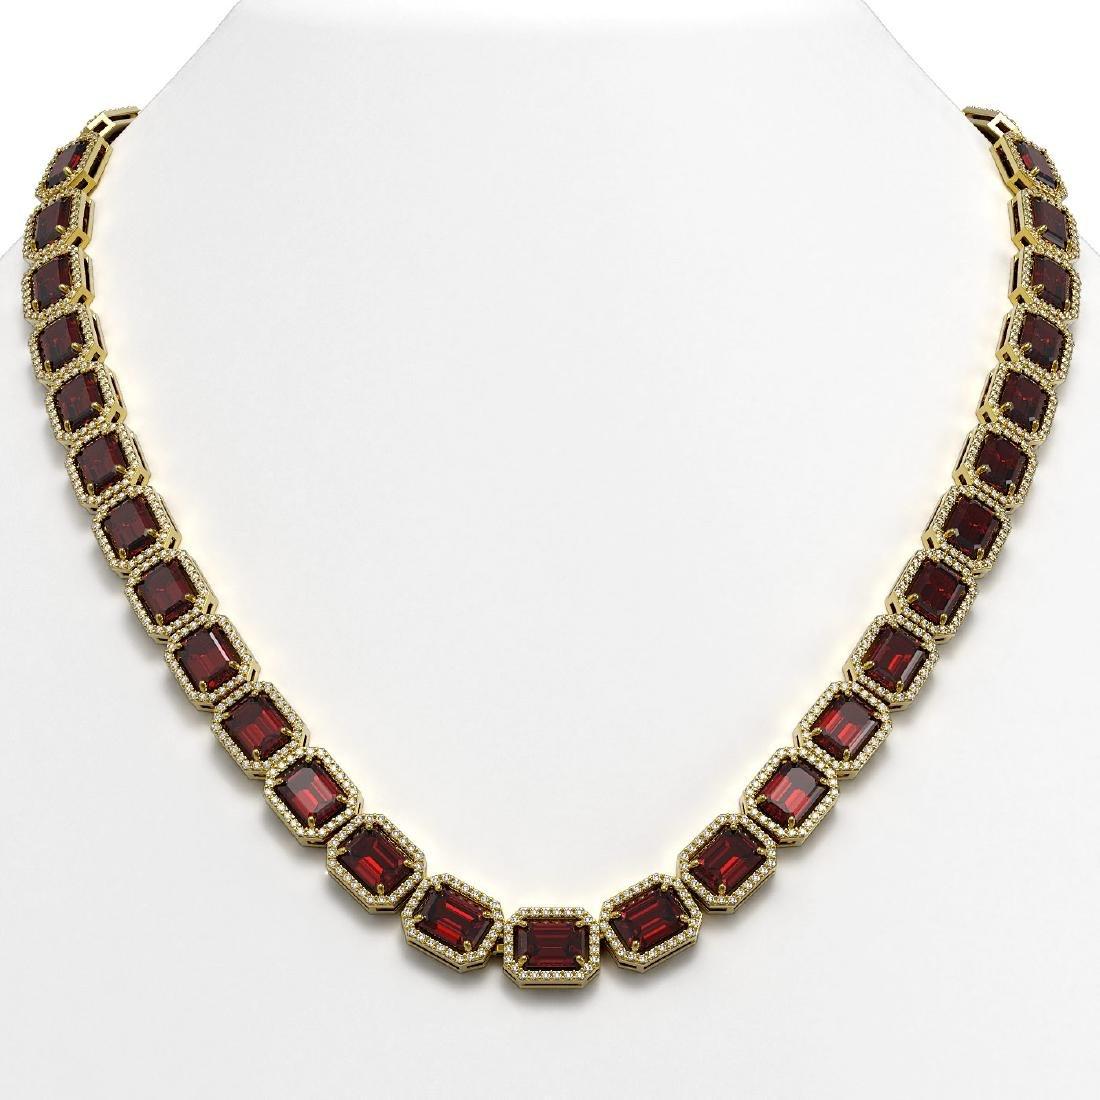 60.59 CTW Garnet & Diamond Halo Necklace 10K Yellow